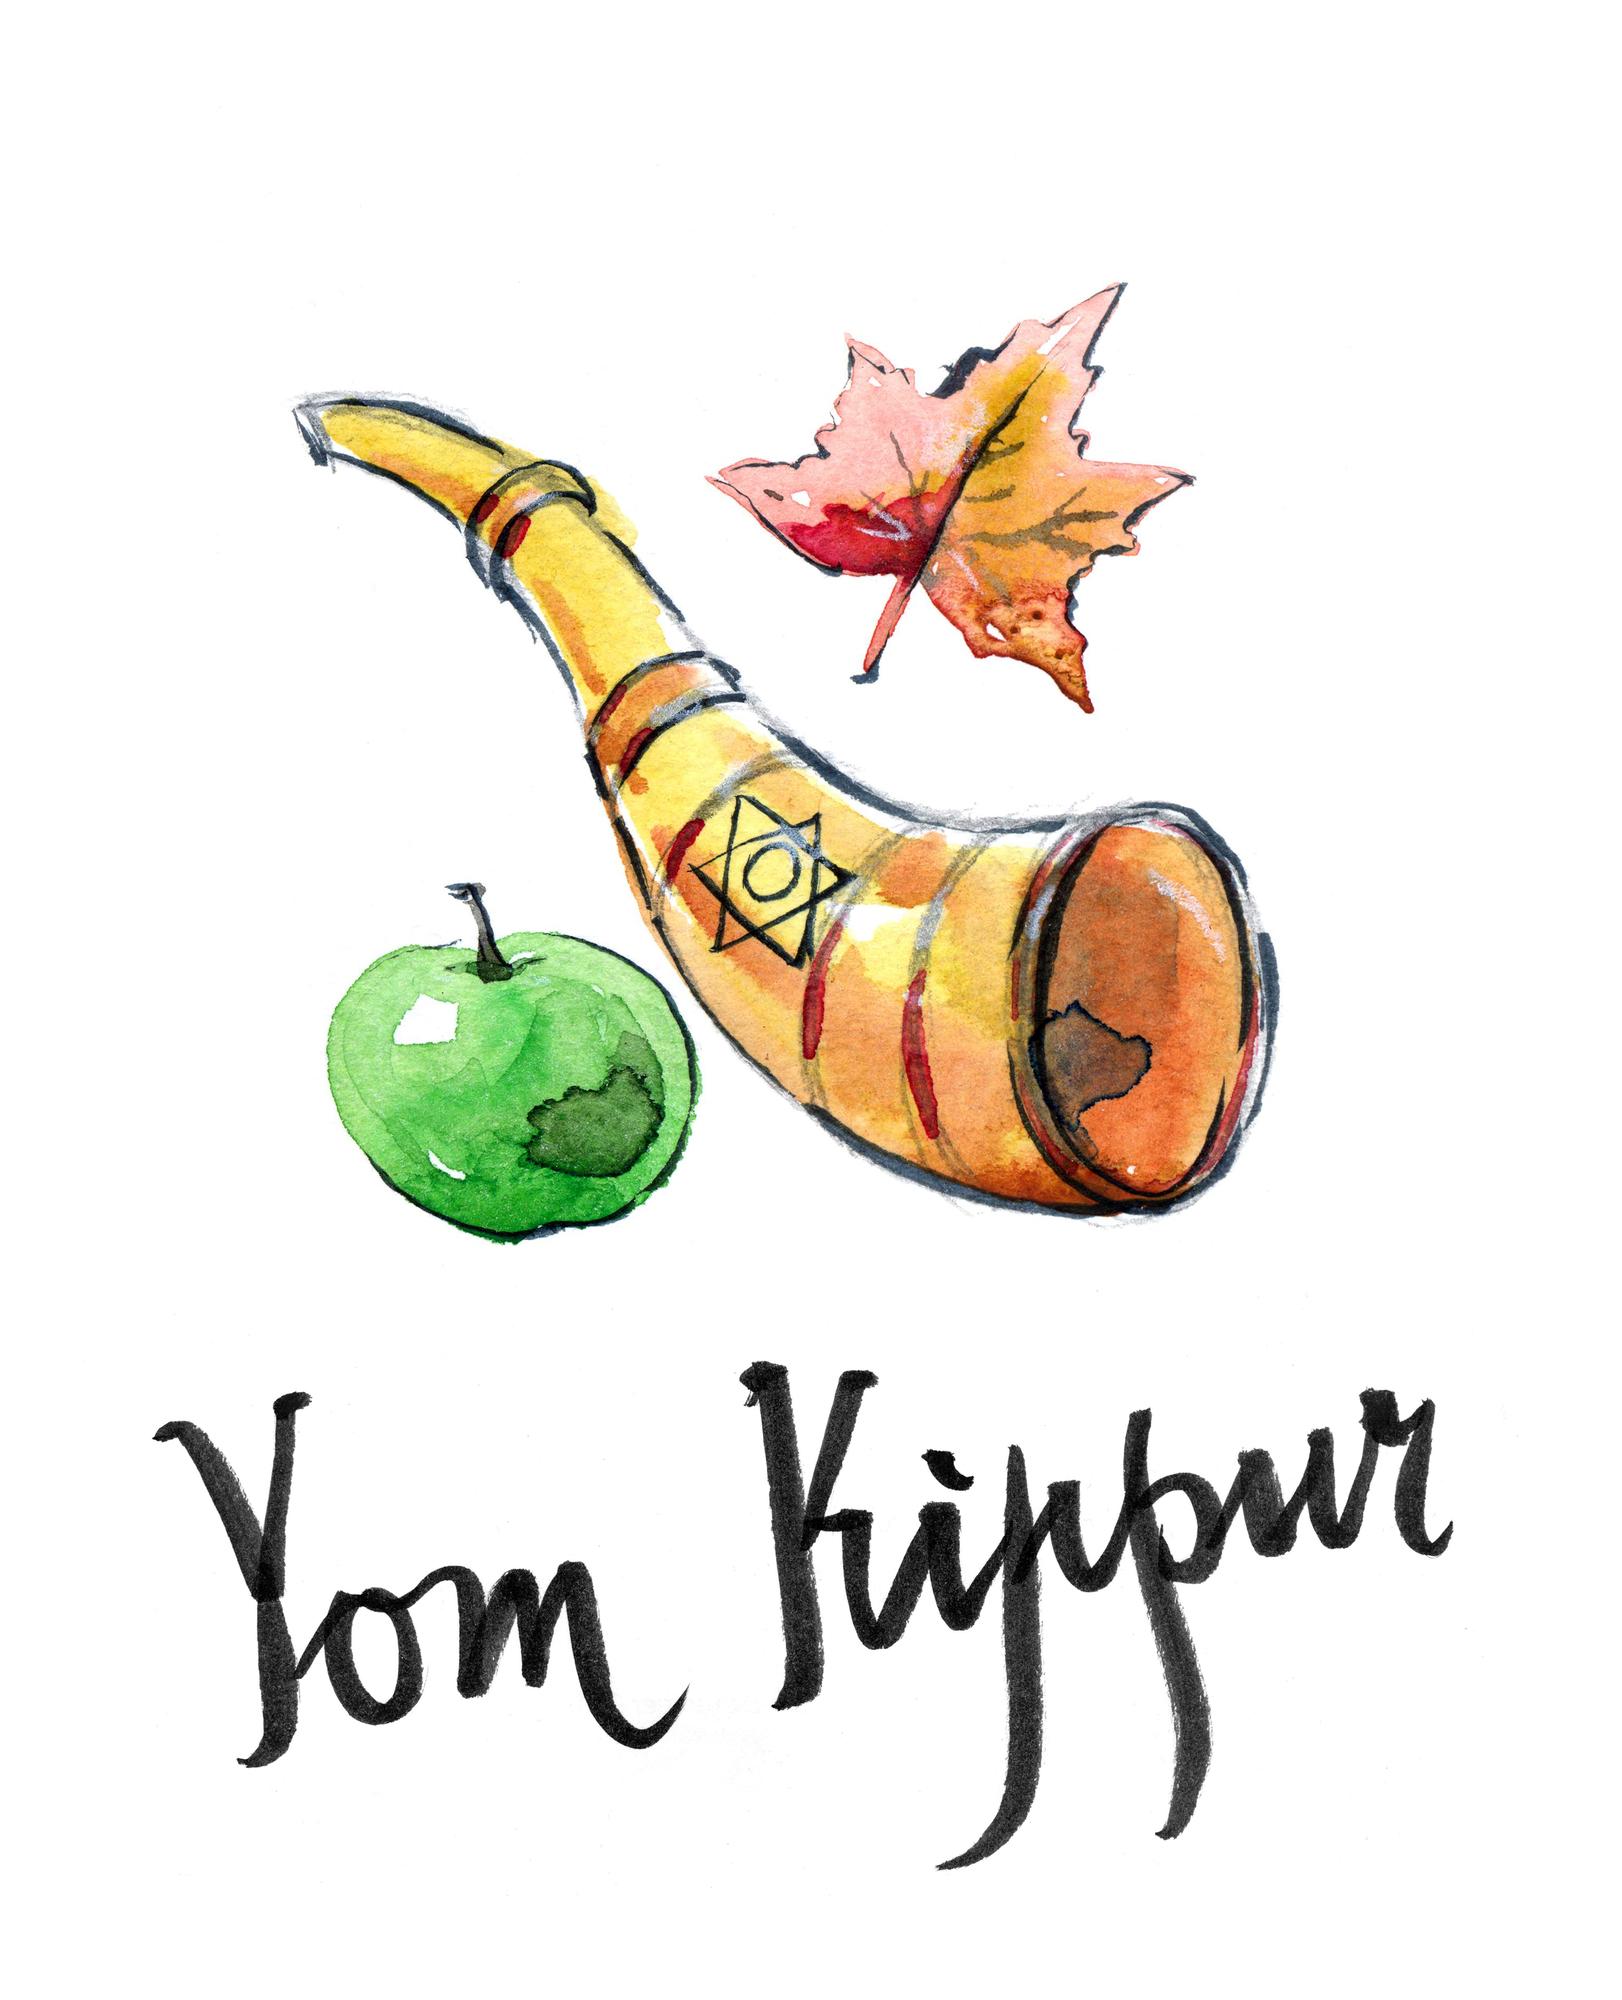 Watercolor shofar, star of David, apple and autumn leaf, hand drawn - Illustration